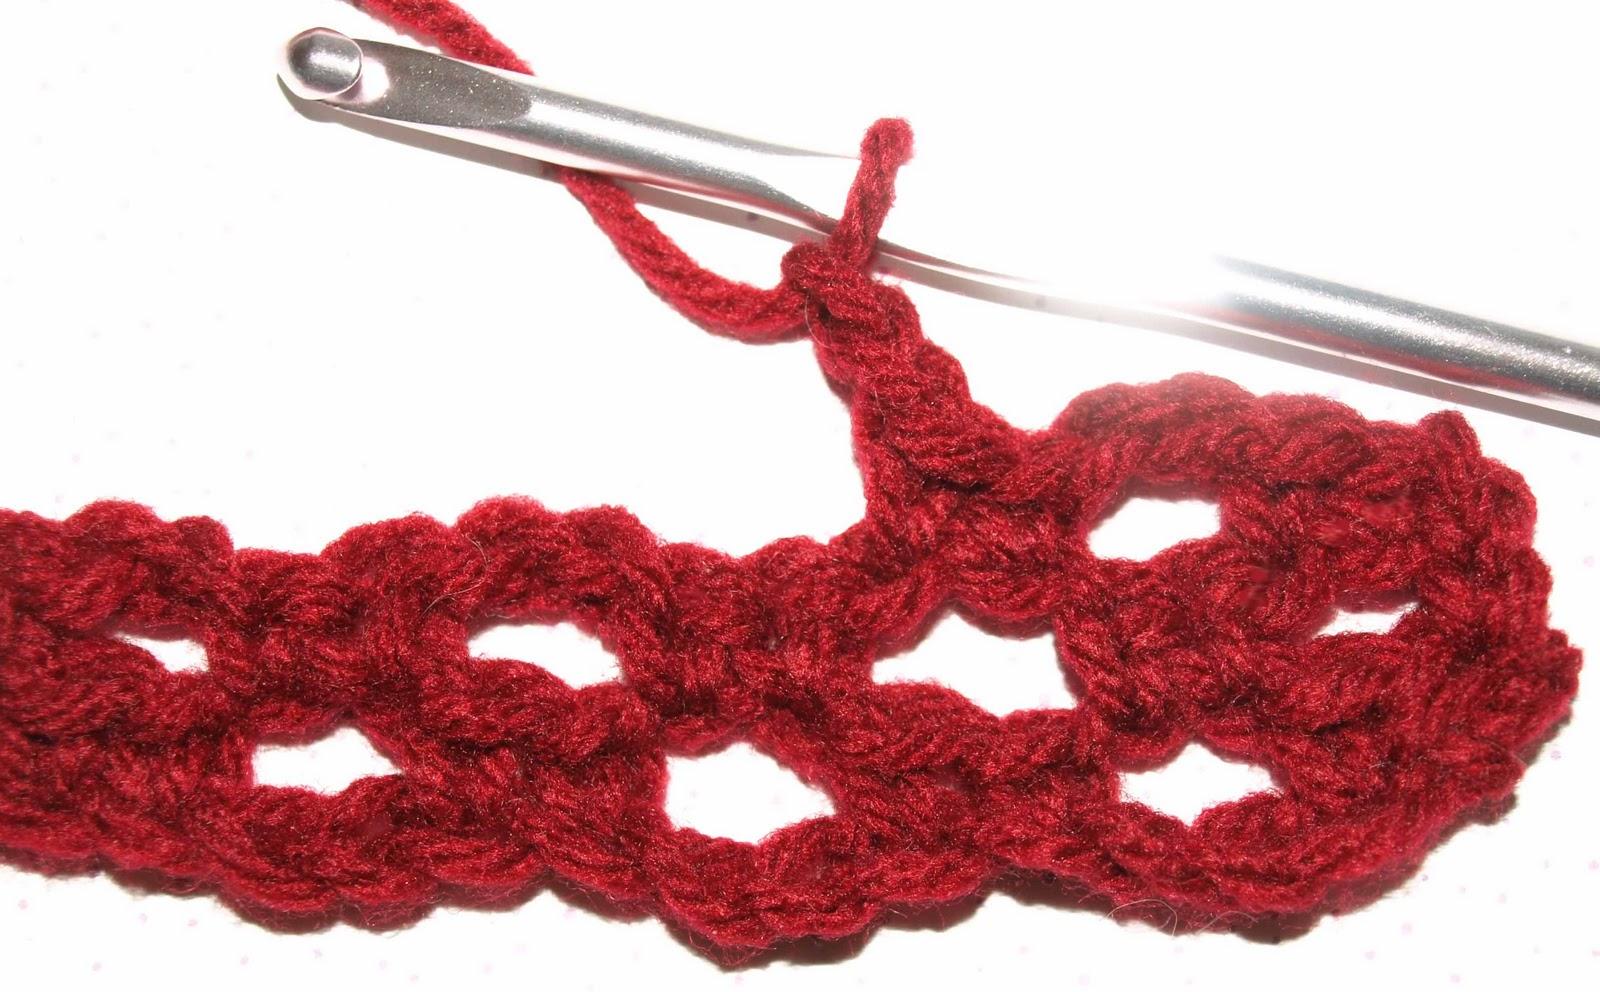 CrochetByKarin: Single Crochet Fence Stitch